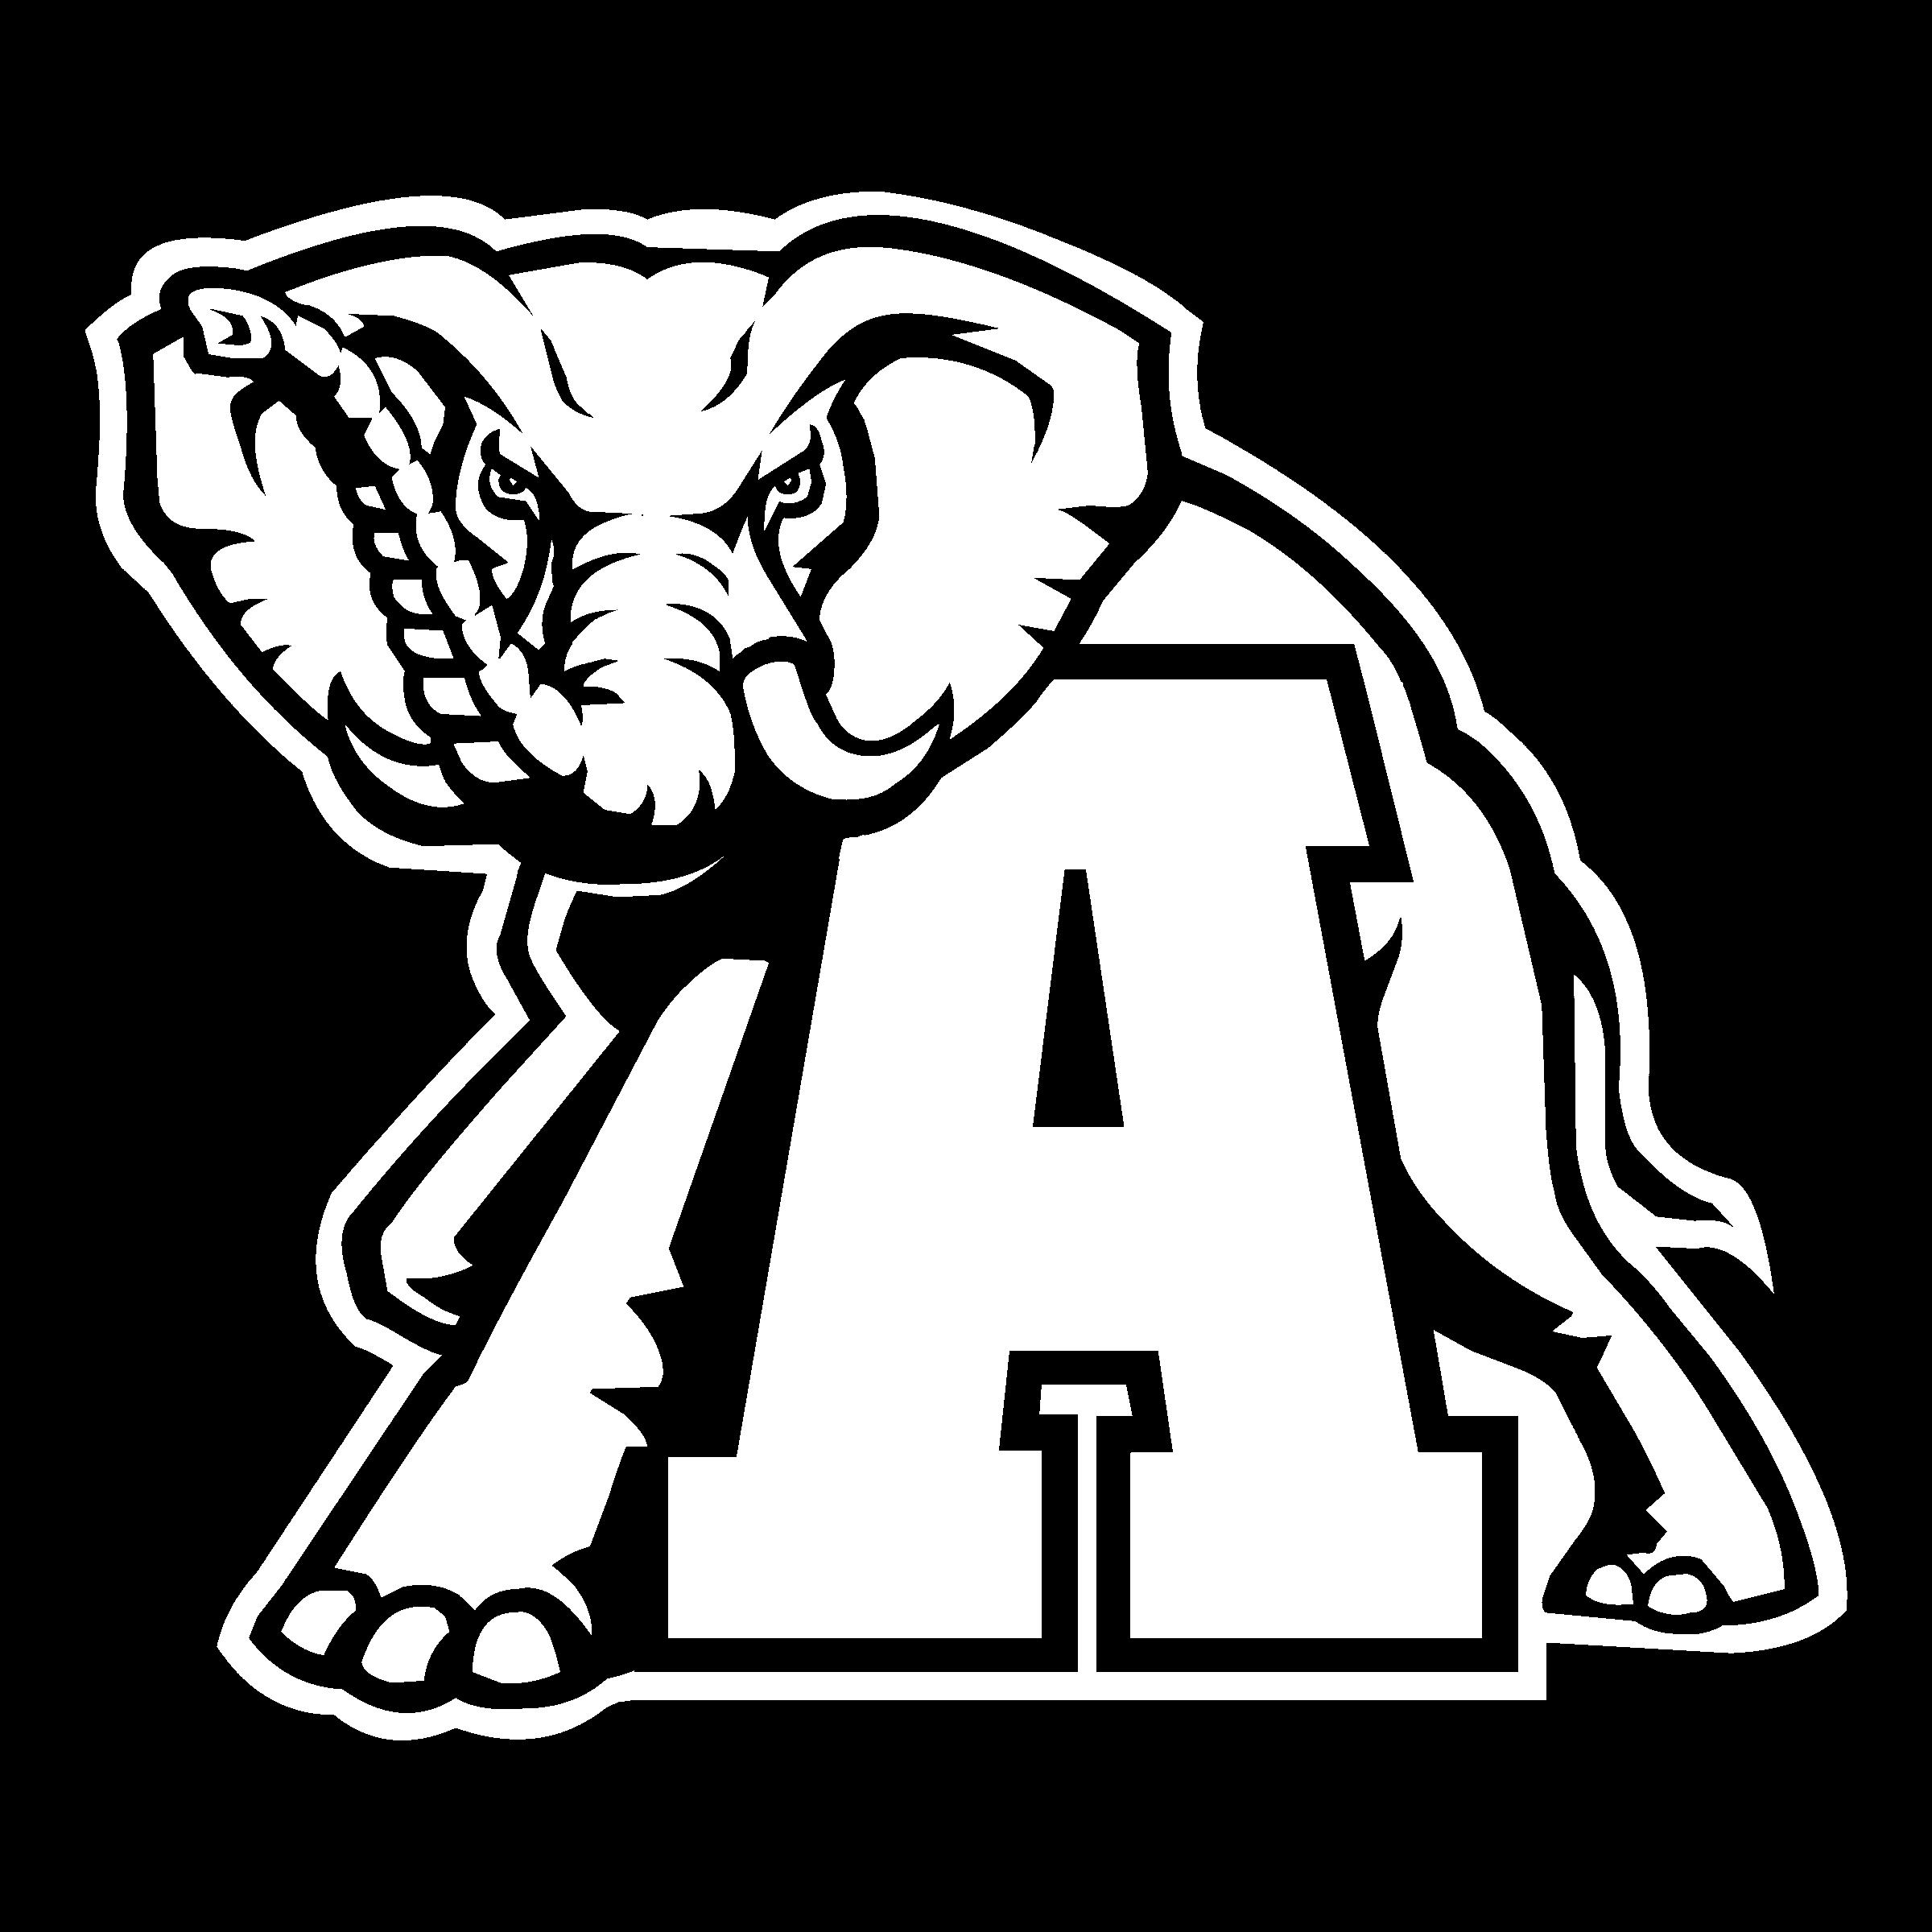 University of Alabama Alabama Crimson Tide football Roll Tide NCAA.